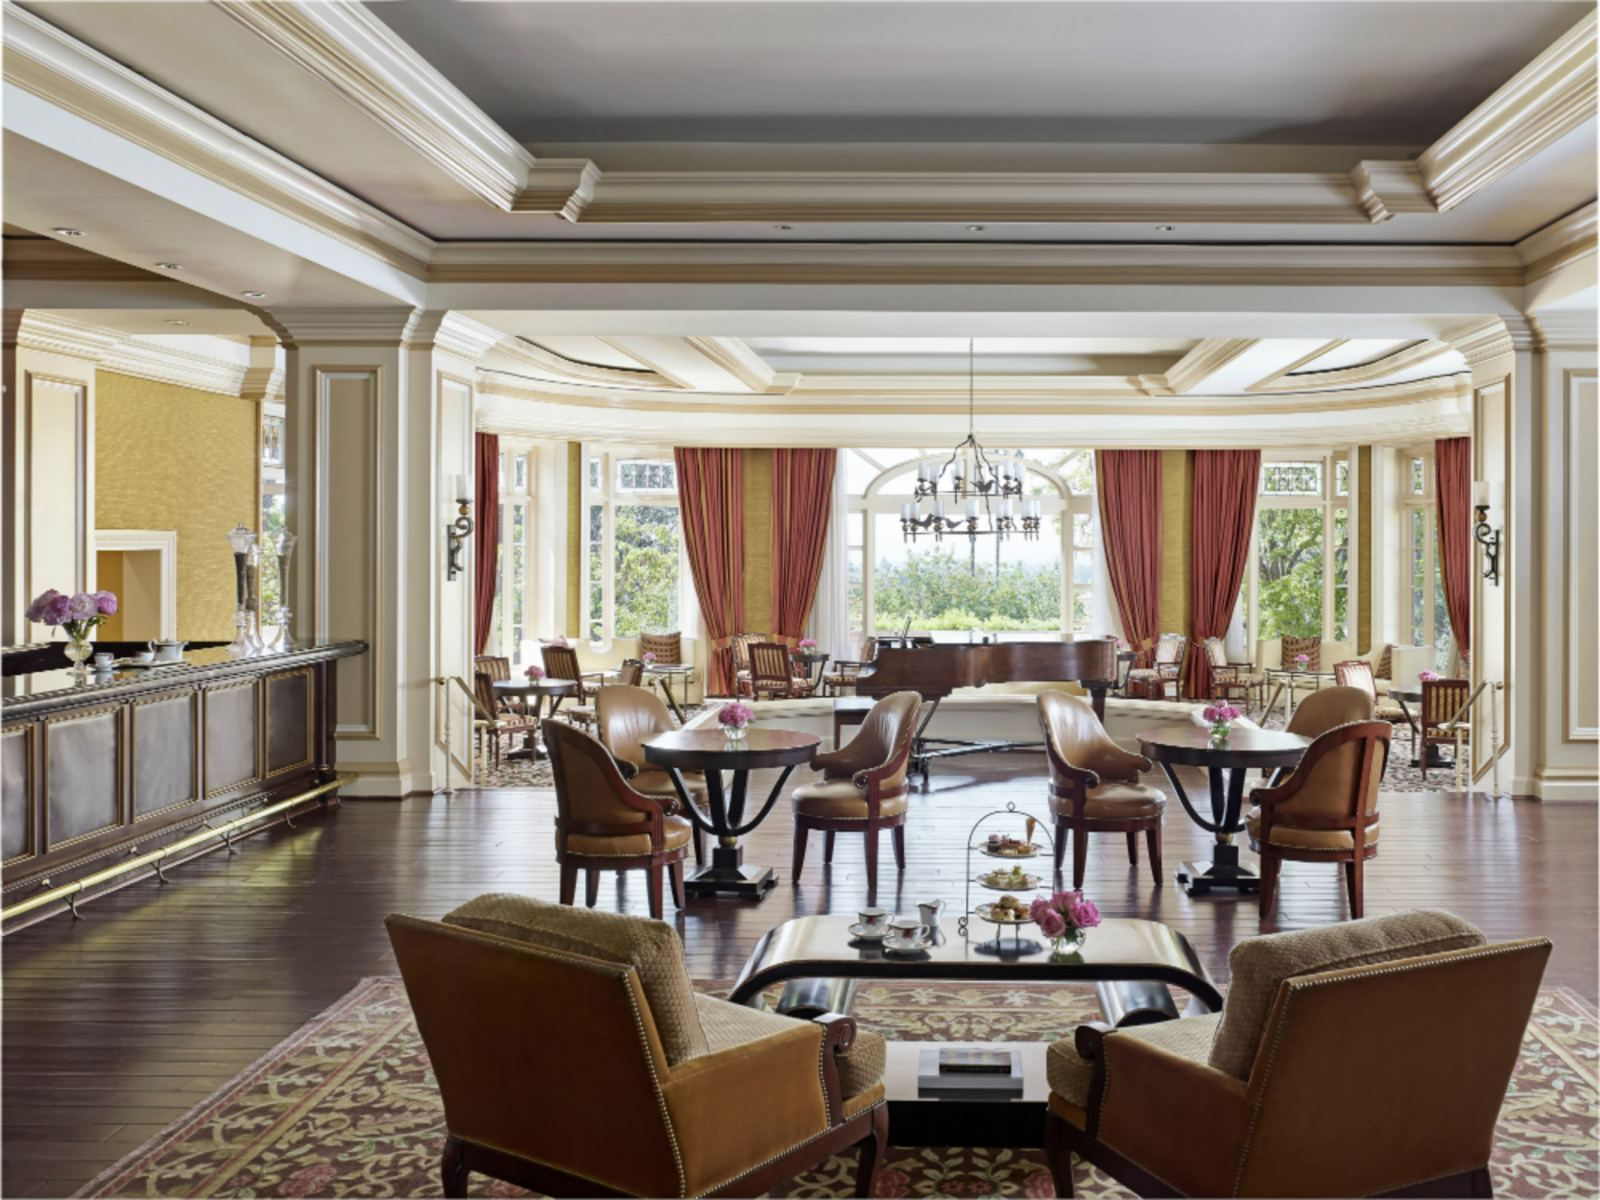 The Lobby Lounge @ The Langham Hotel Pasadena